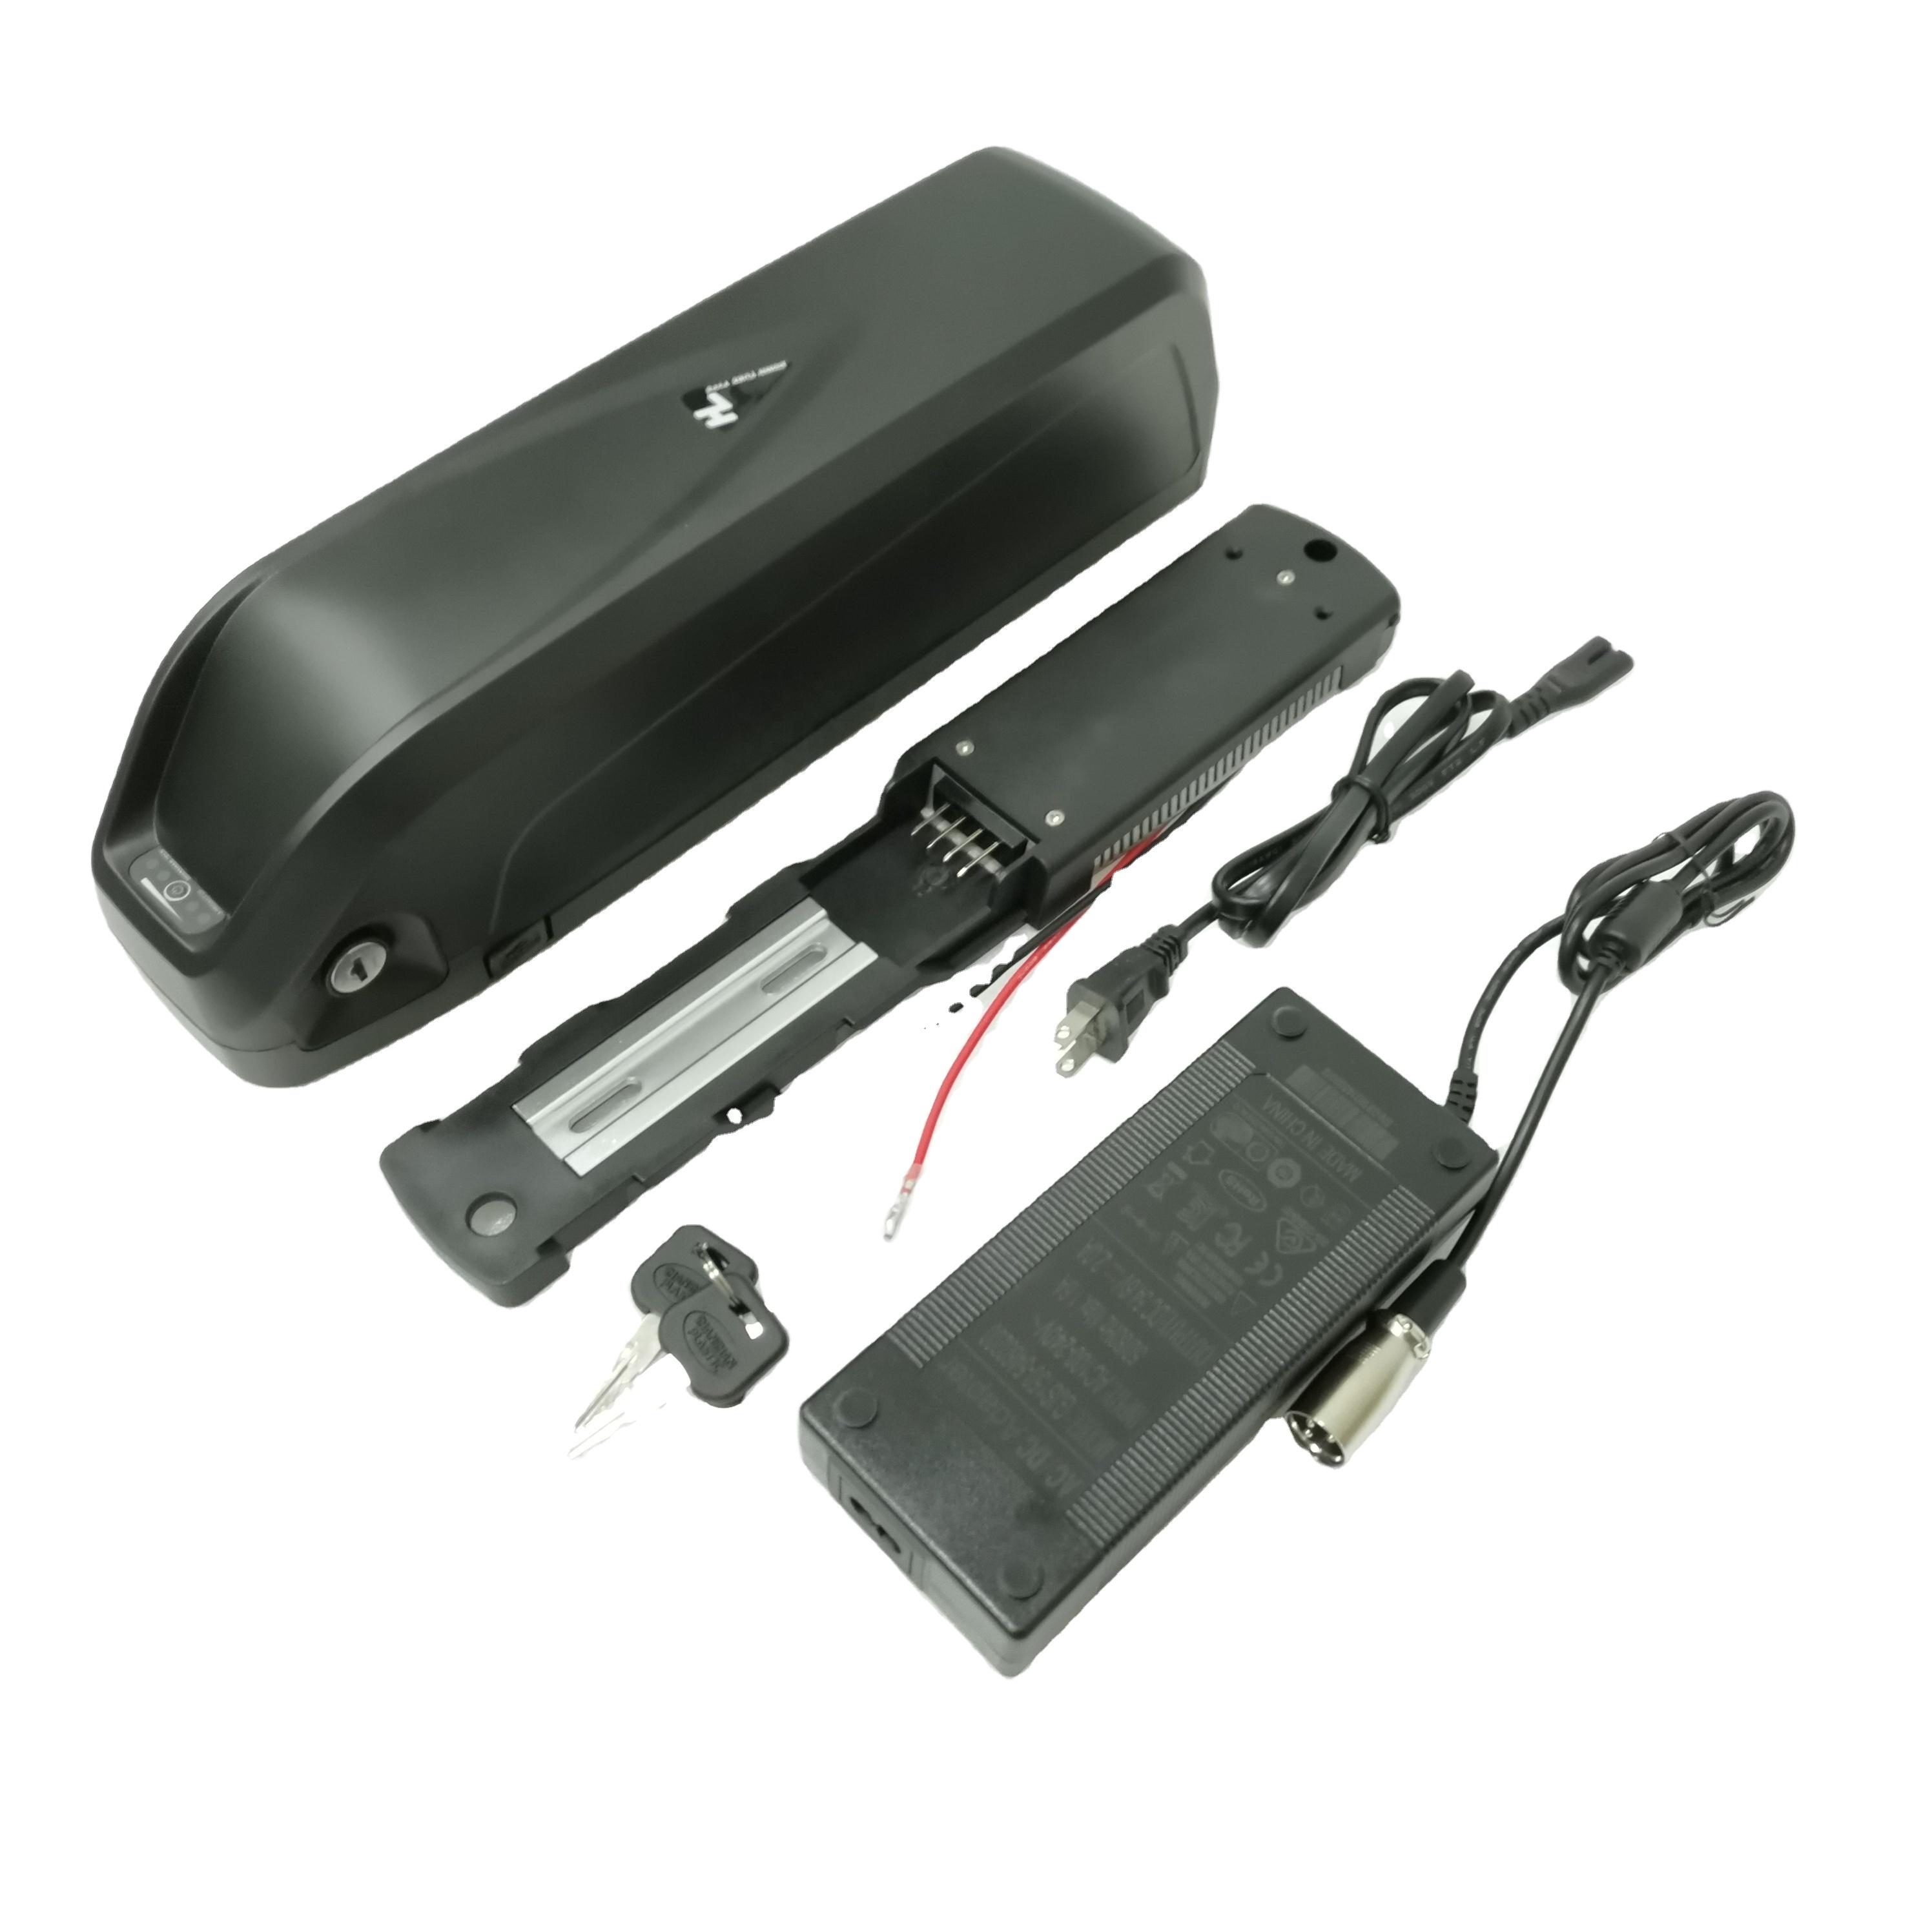 48v18ah 1000w hailong downtube mounted battery 48v 20ah electric bike battery lithium ion battery pack